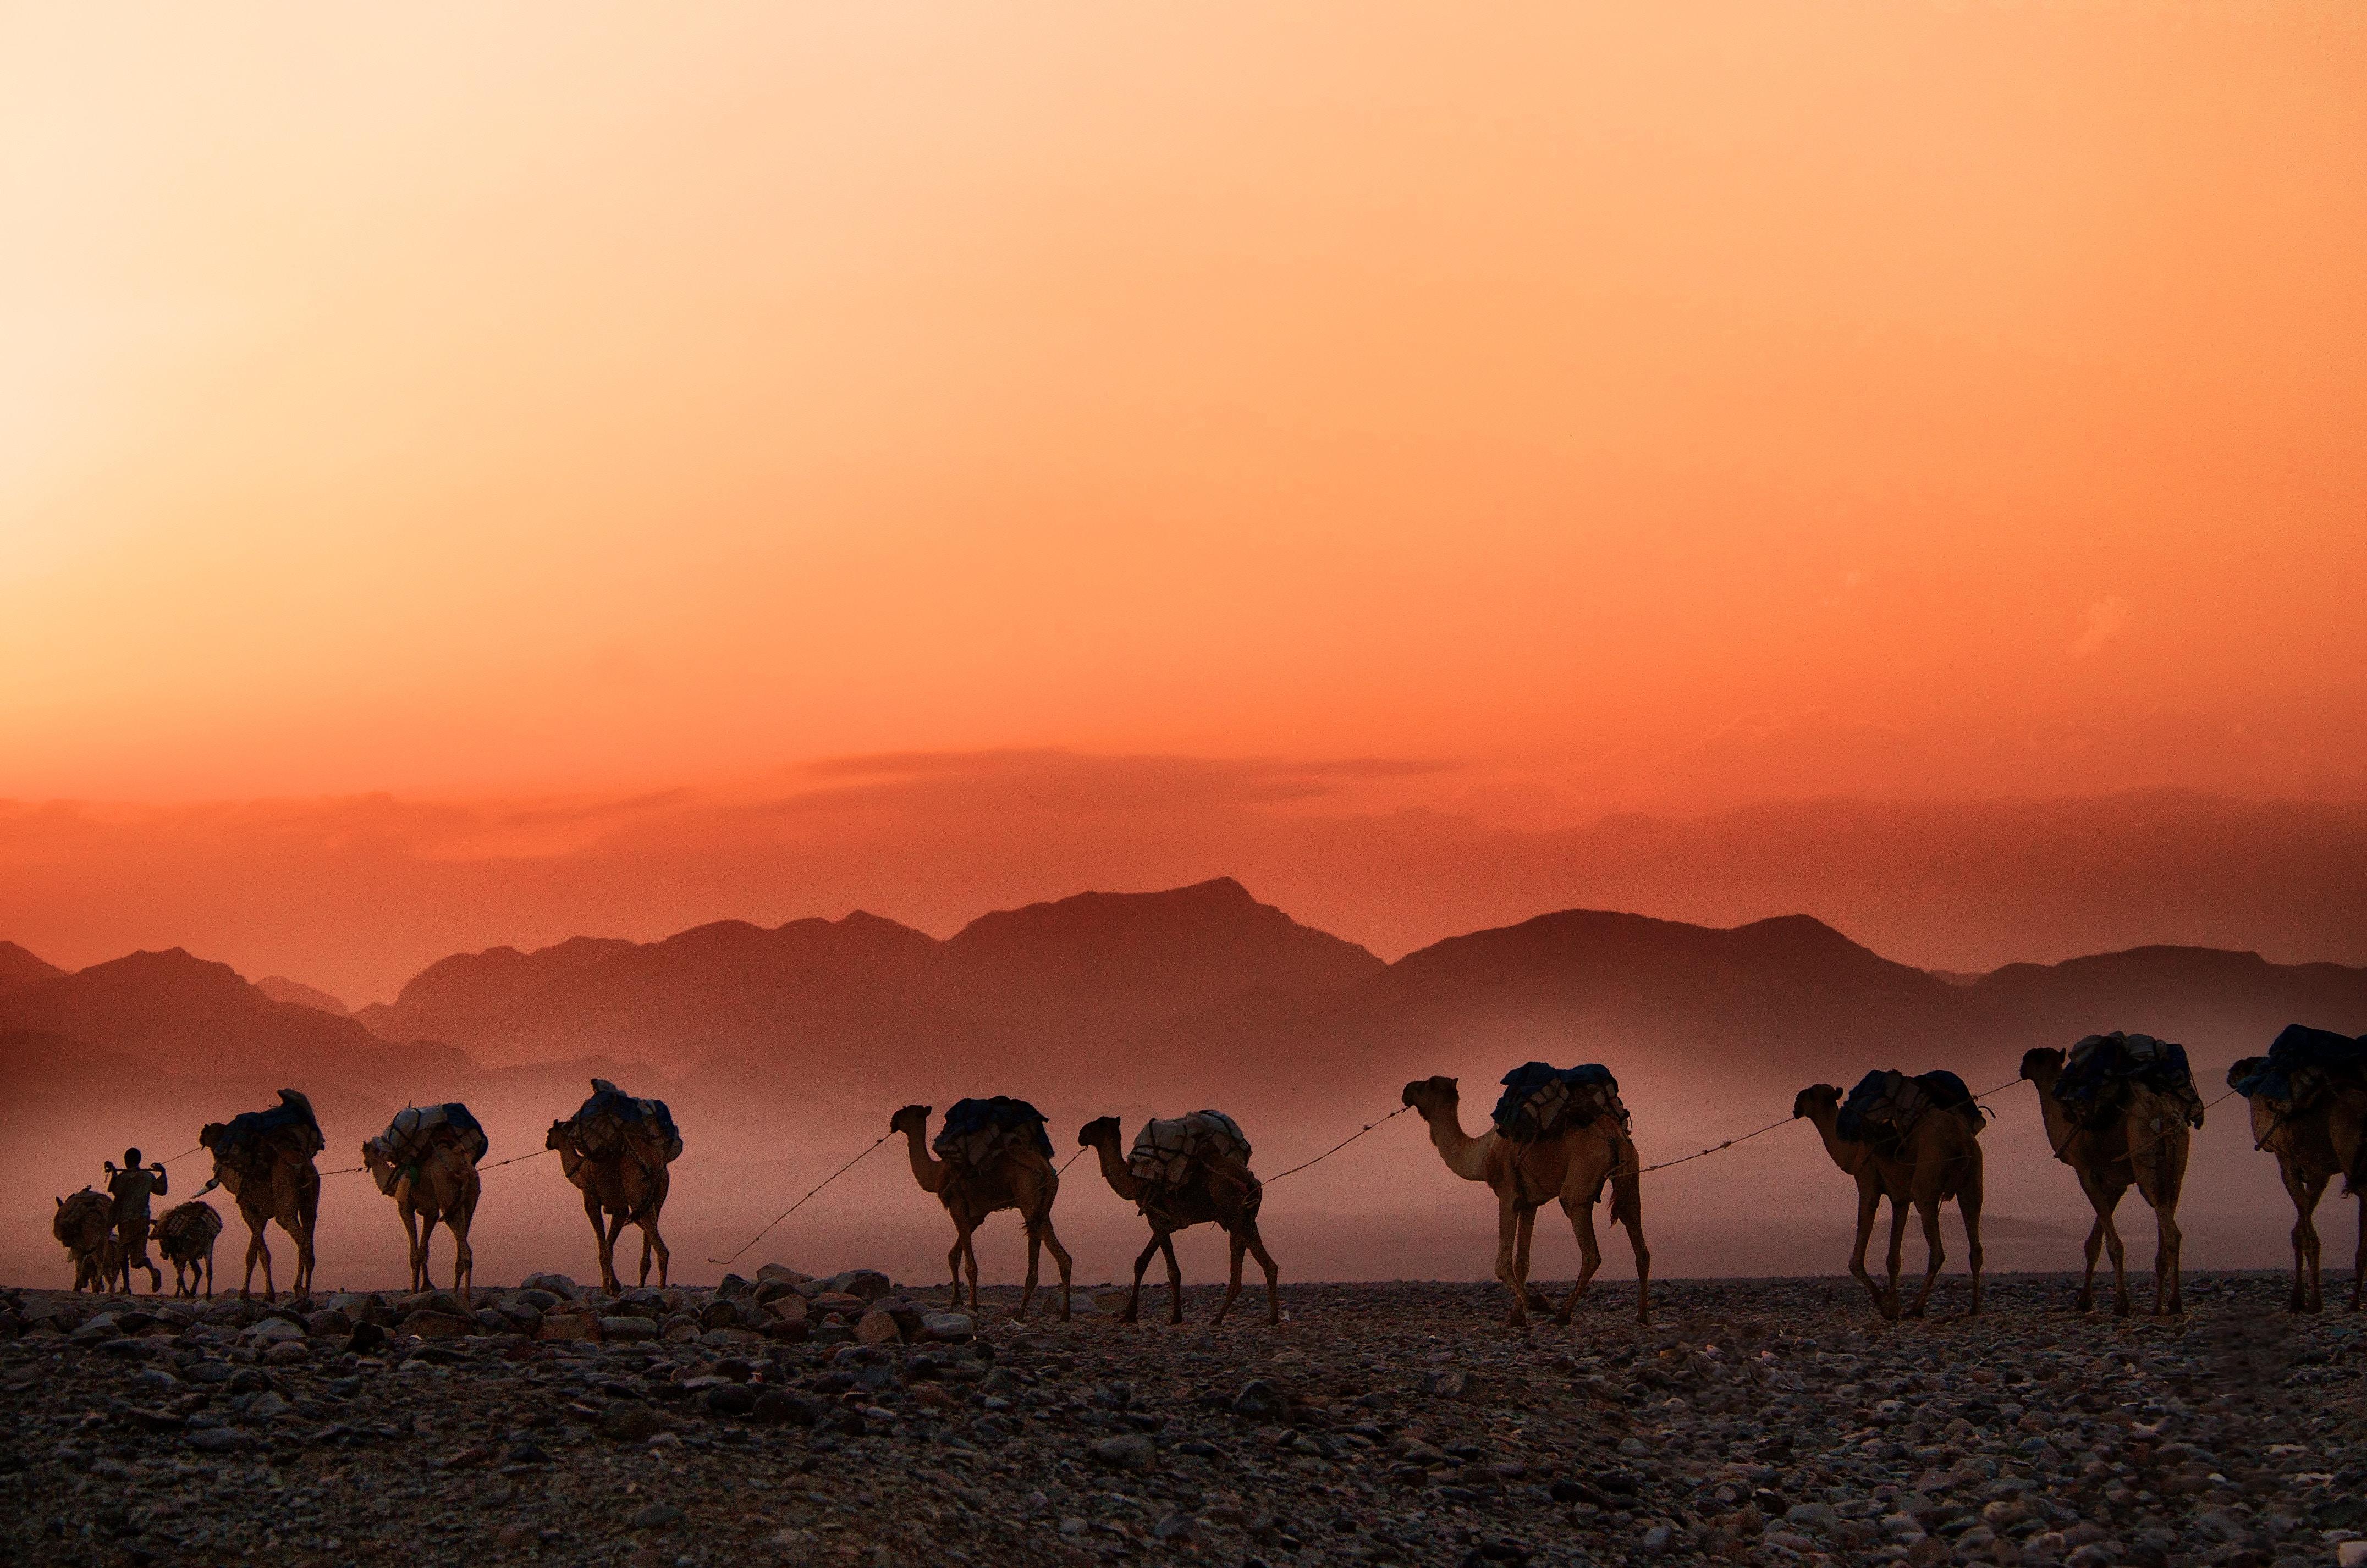 Éthiopie – Timkat : spiritualité en Éthiopie